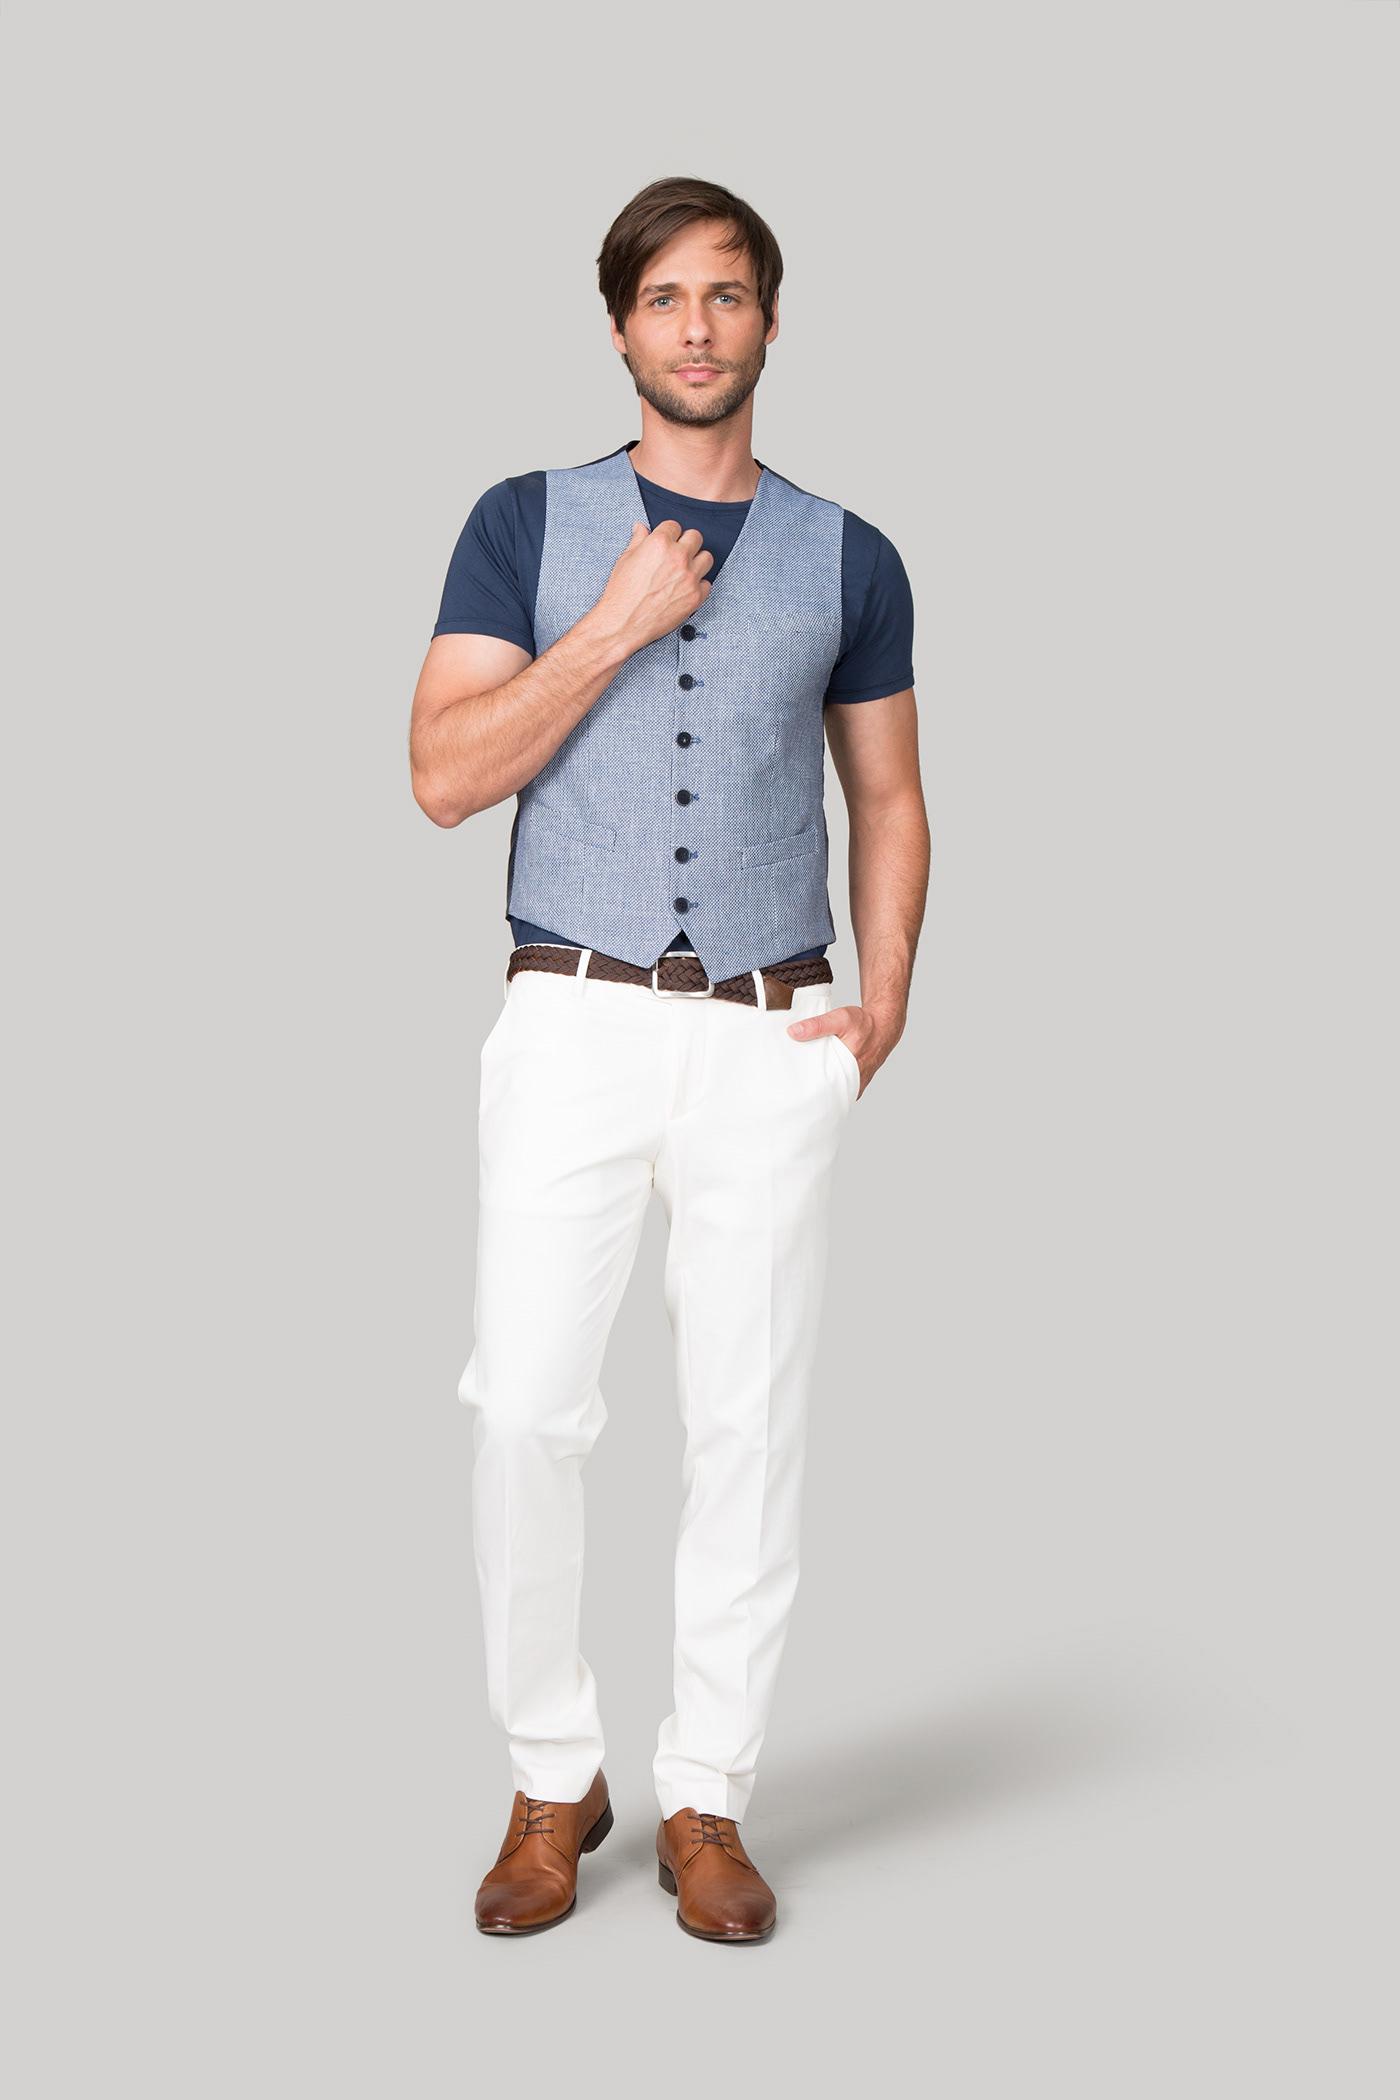 arrow artèfoto catalogo clothes editorial Fashion  man moda retoque vestuario